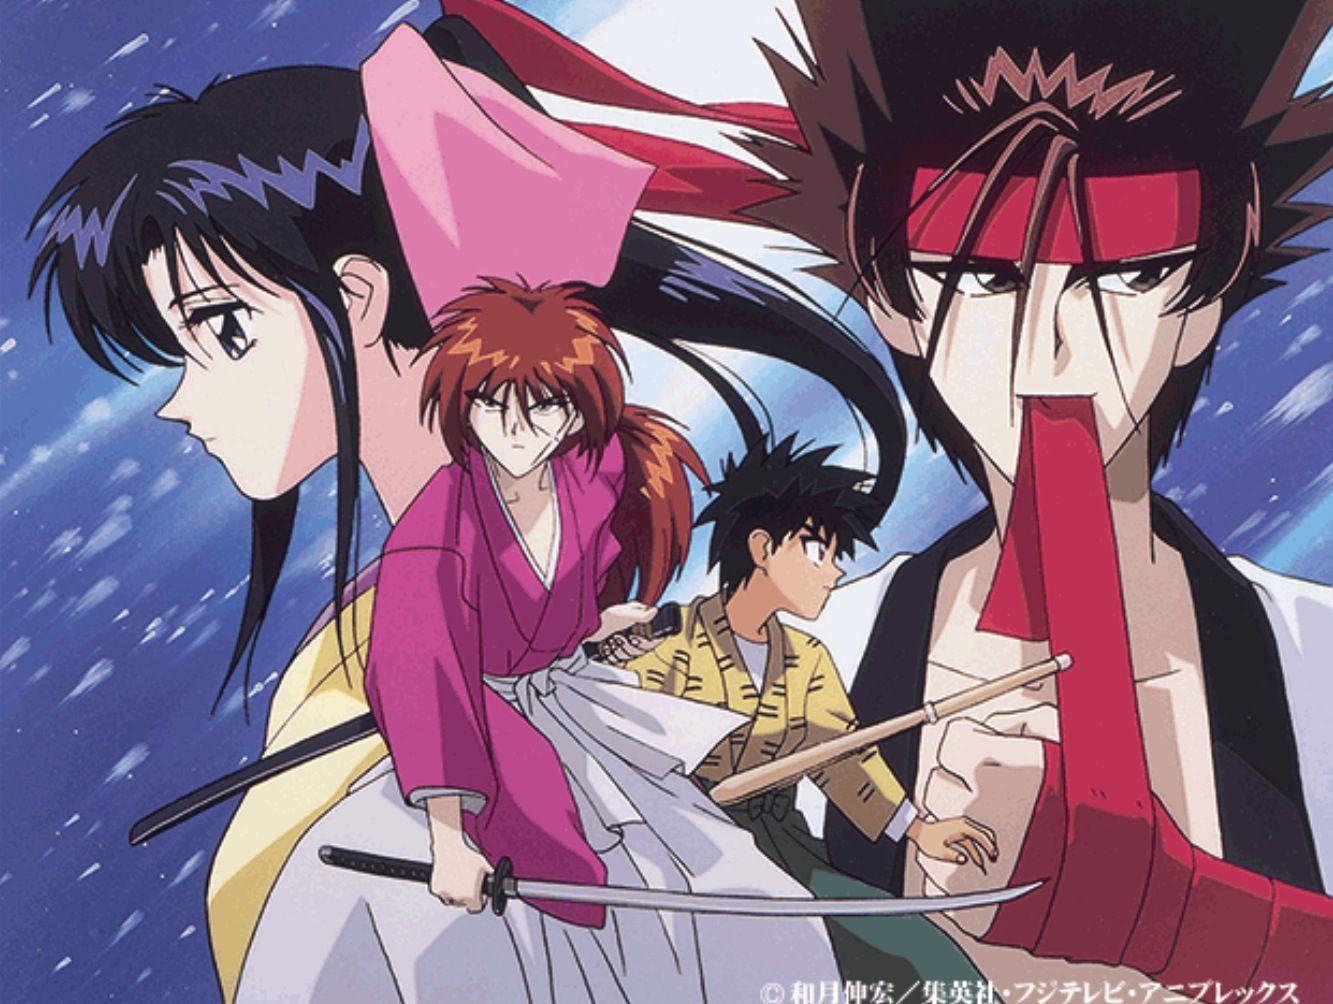 Rurouni kenshin! Kenshin anime, Rurouni kenshin, Anime